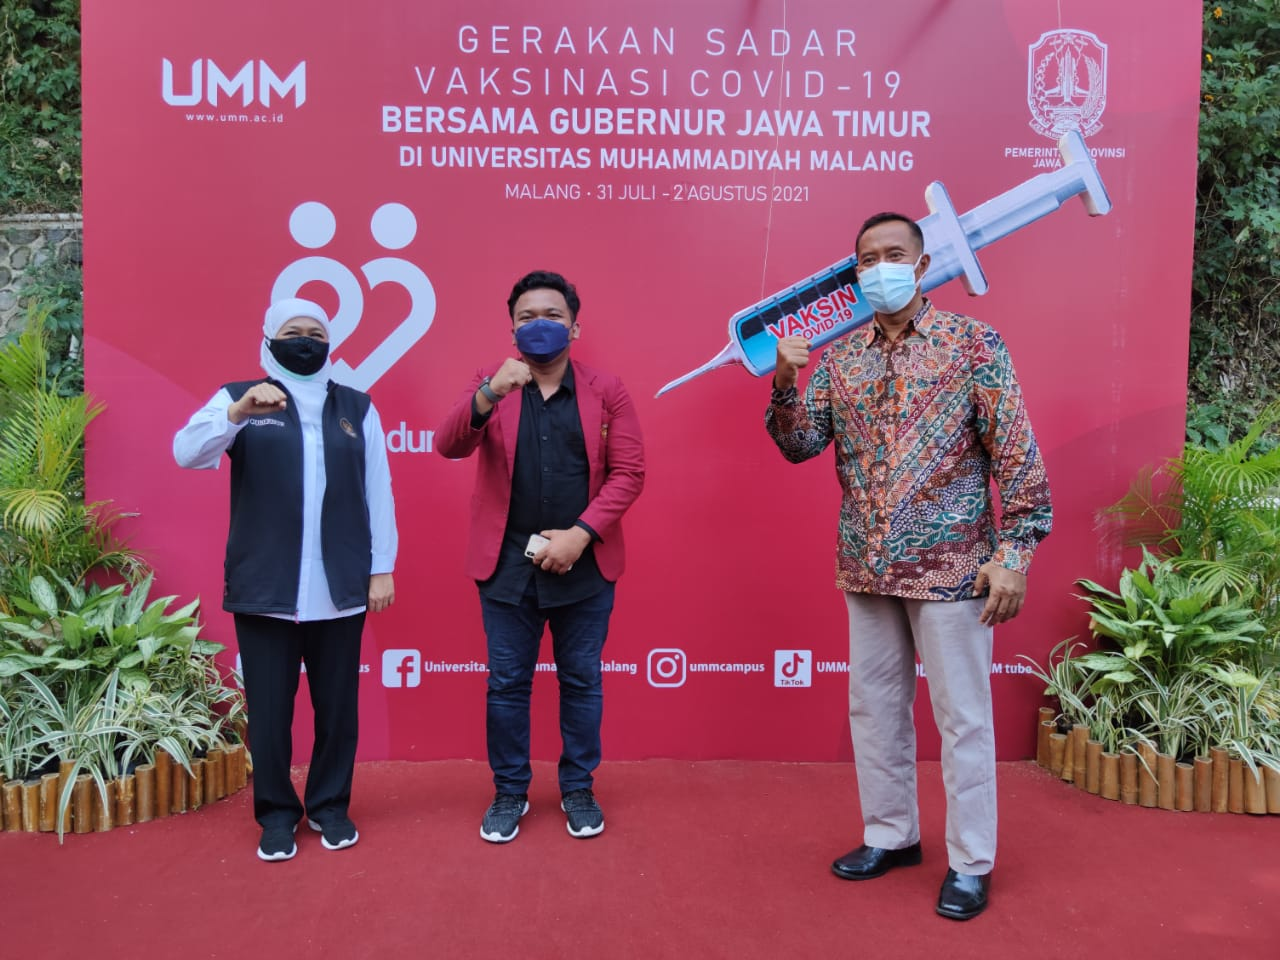 Gubernur Khofifah (Kiri) bersama Rektor UMM (kanan) dalam Gerakan Sadar Vaksin Covid-19 di UMM Malang